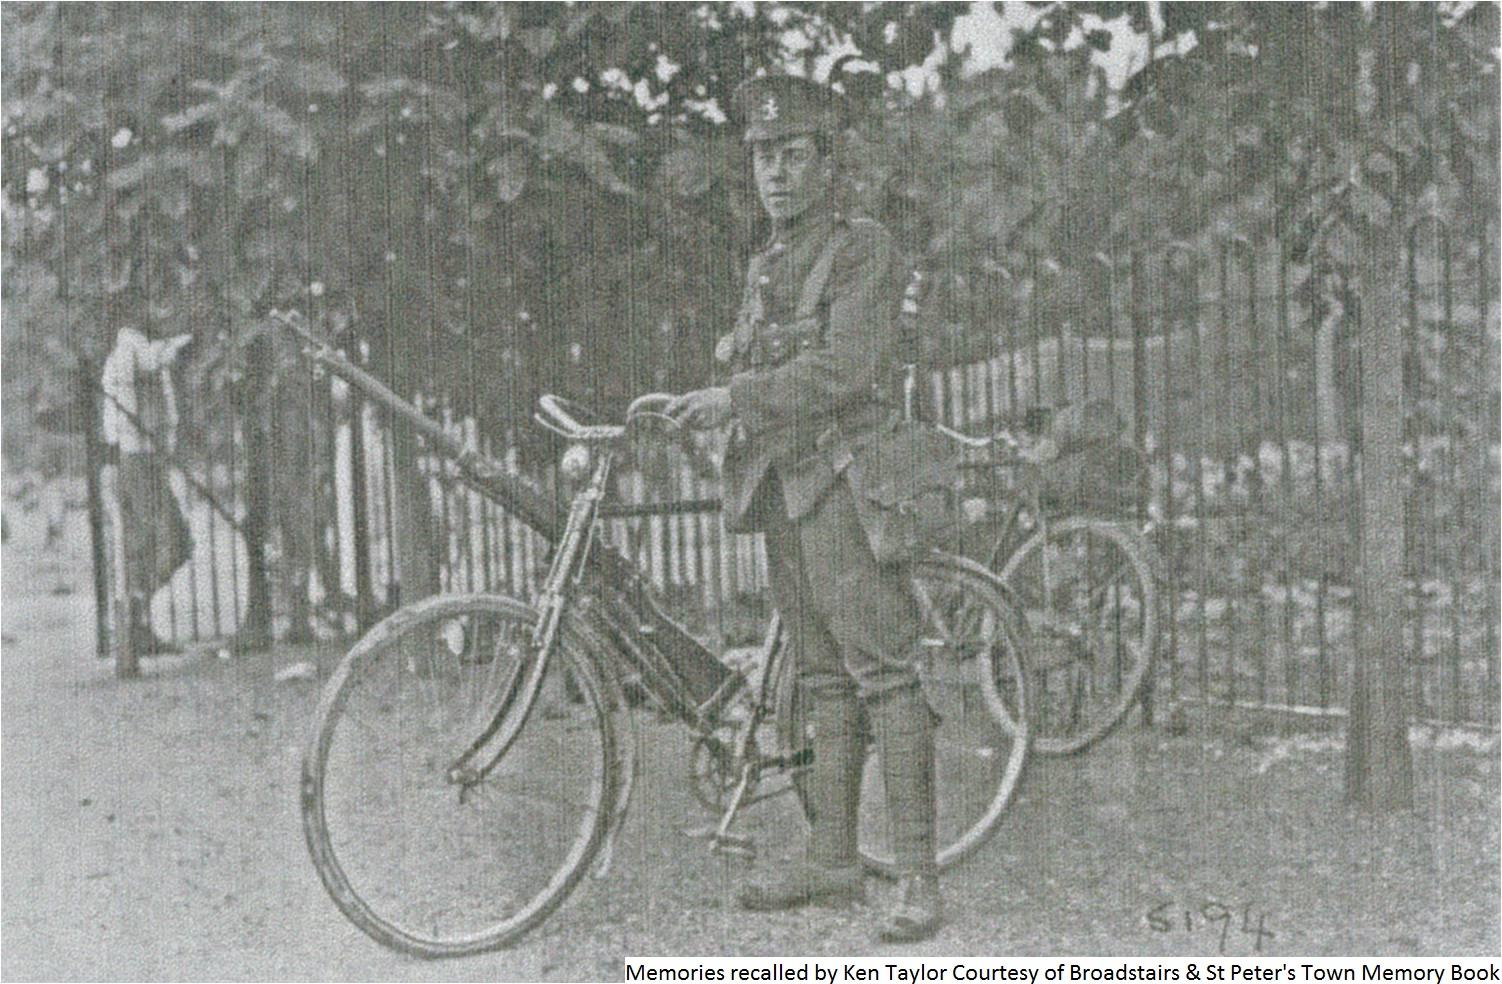 361RAM - Percy Taylor Kent Cyclist